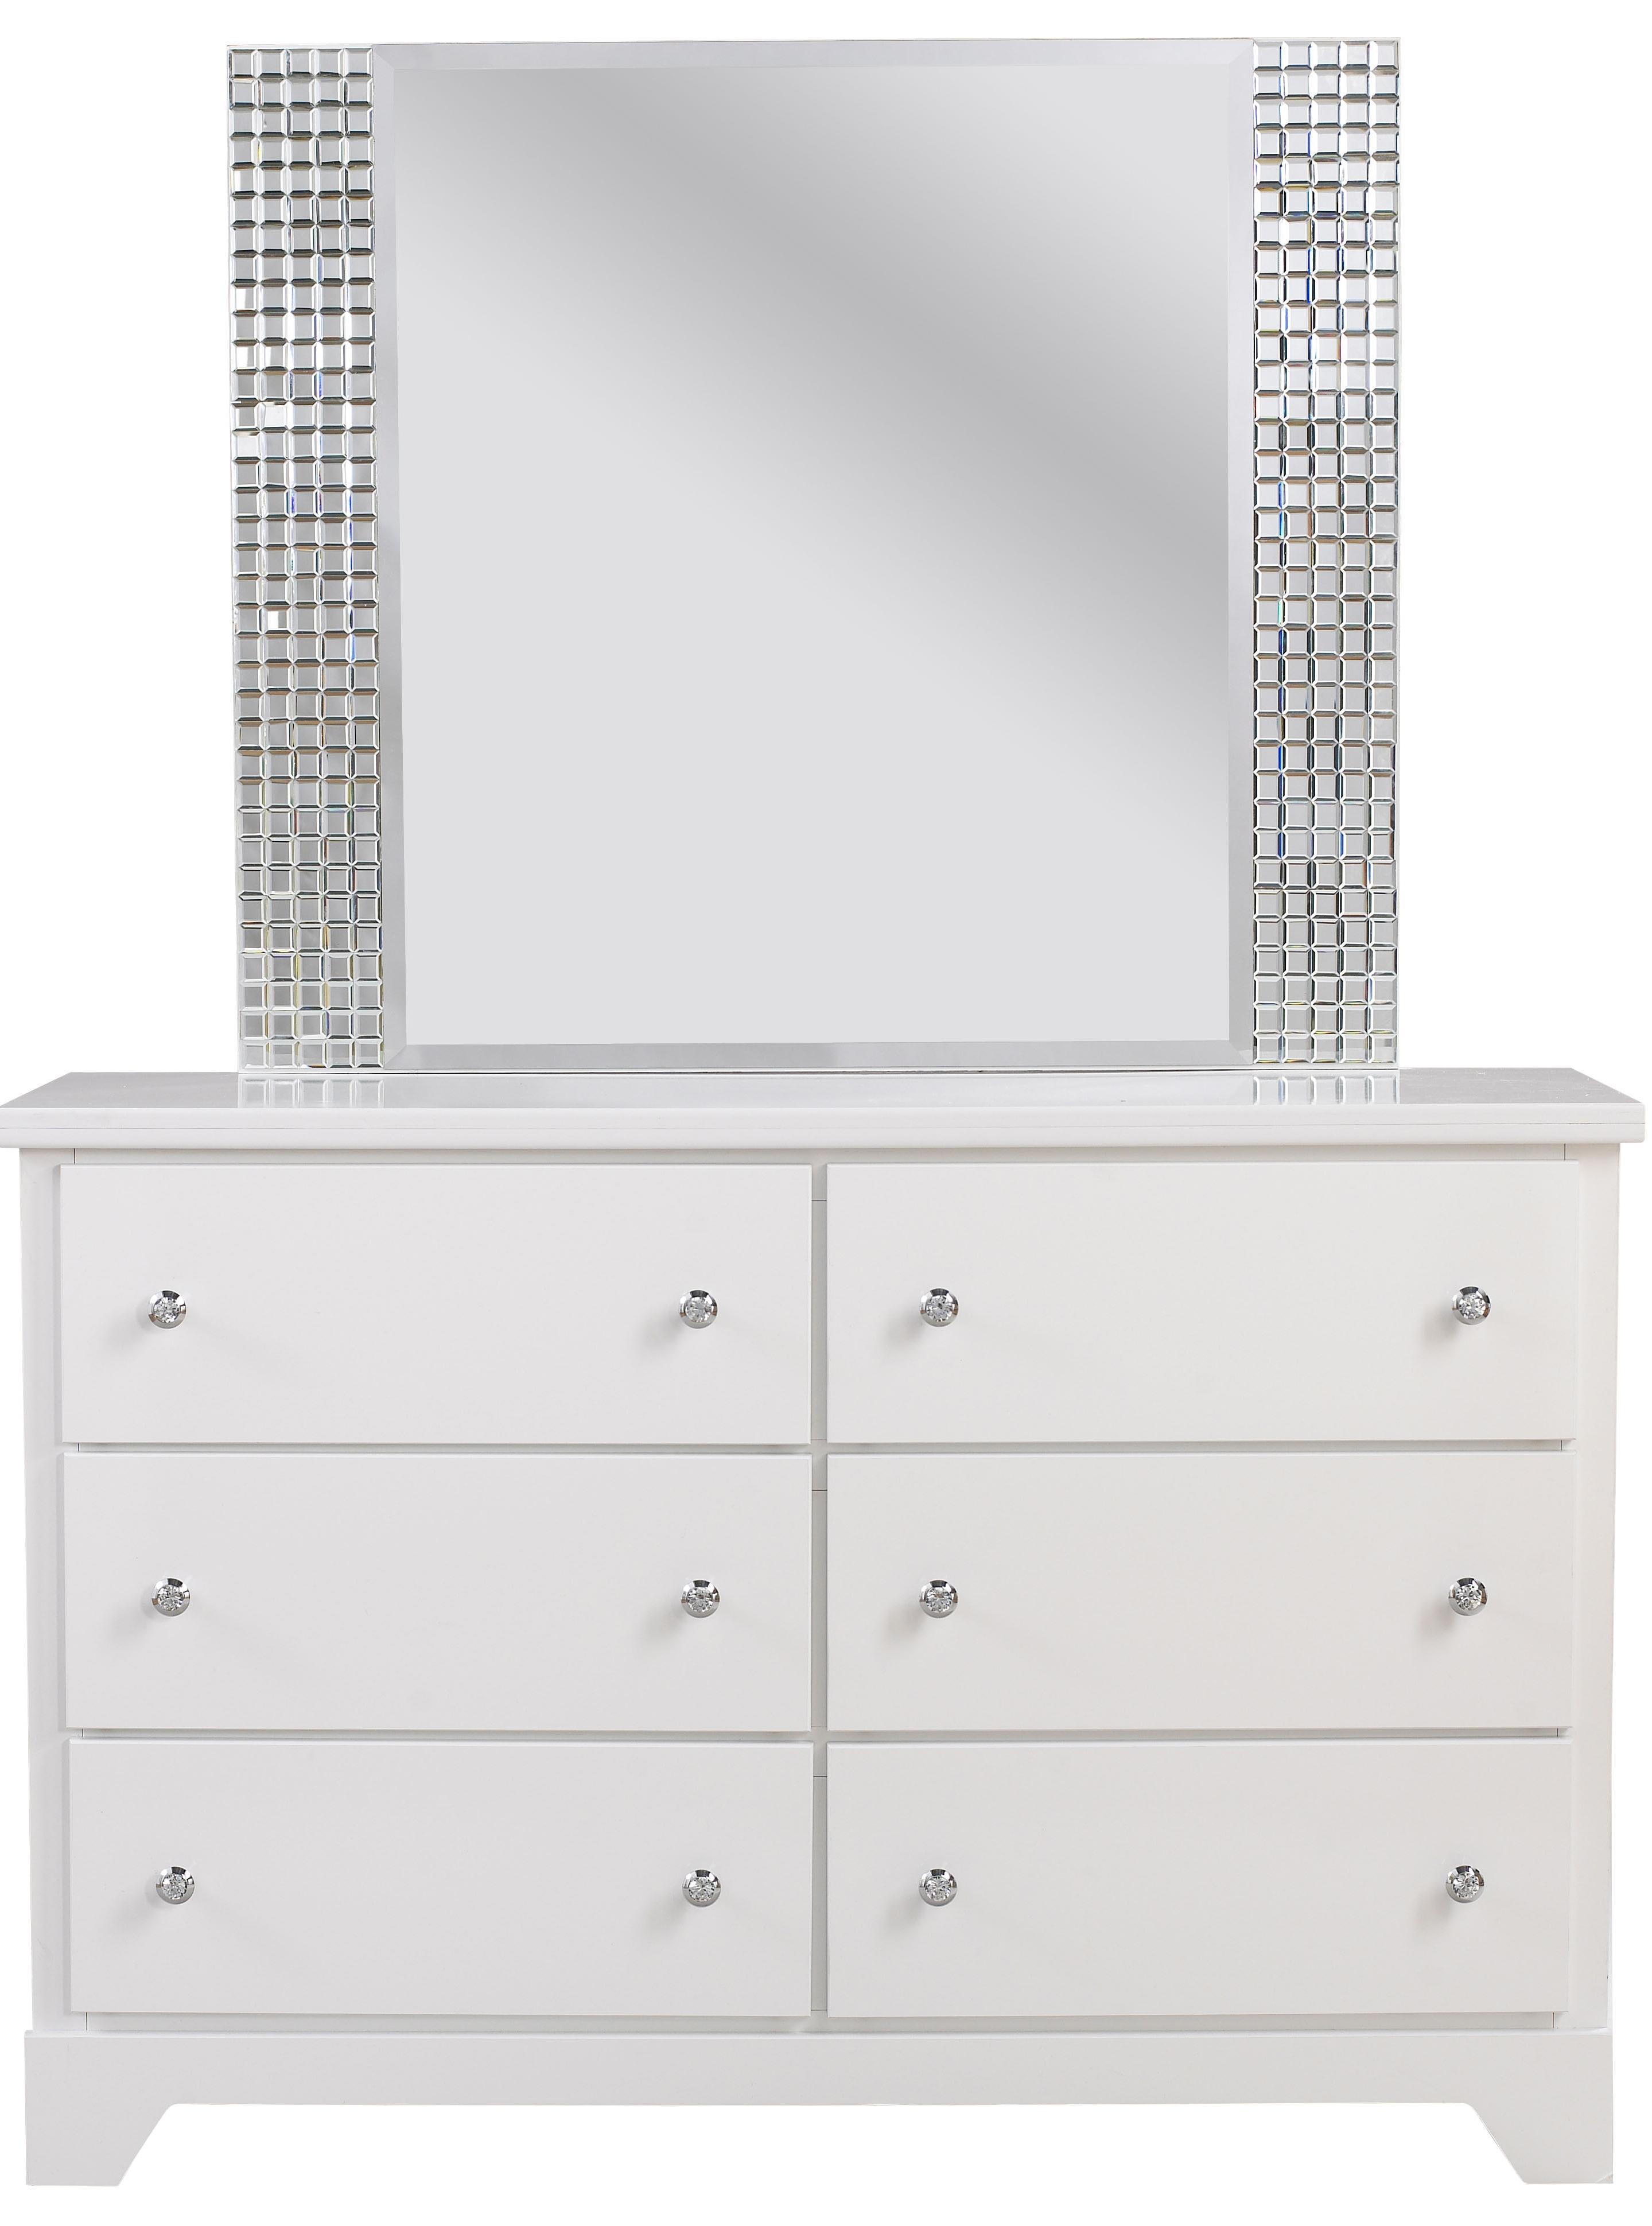 Standard Furniture Marilyn Youth Dresser & Mirror - Item Number: 66309+18